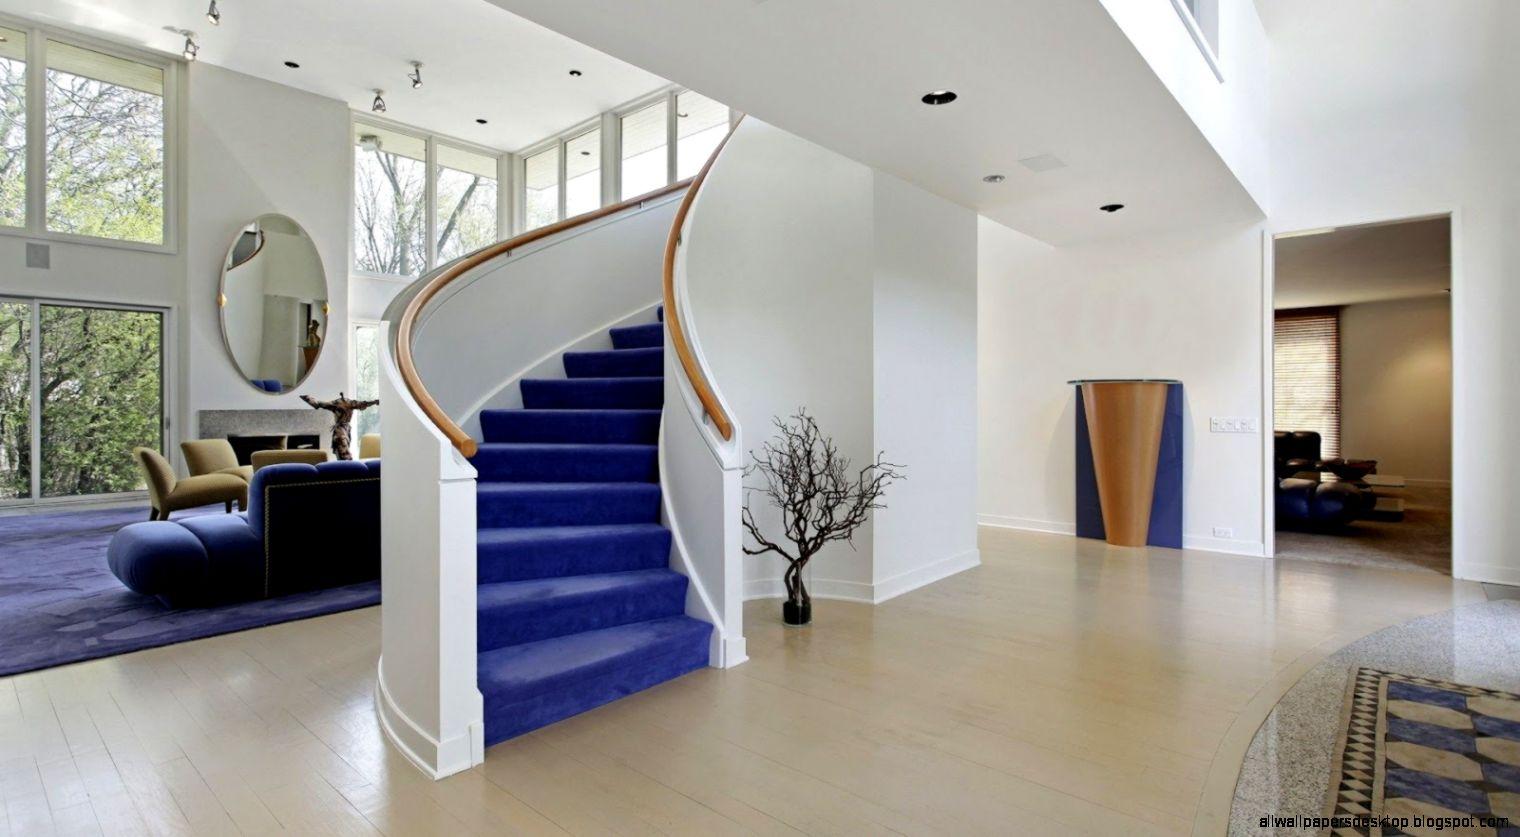 Best interior design wallpaper hd all wallpapers desktop - Wallpaper interior design pictures ...